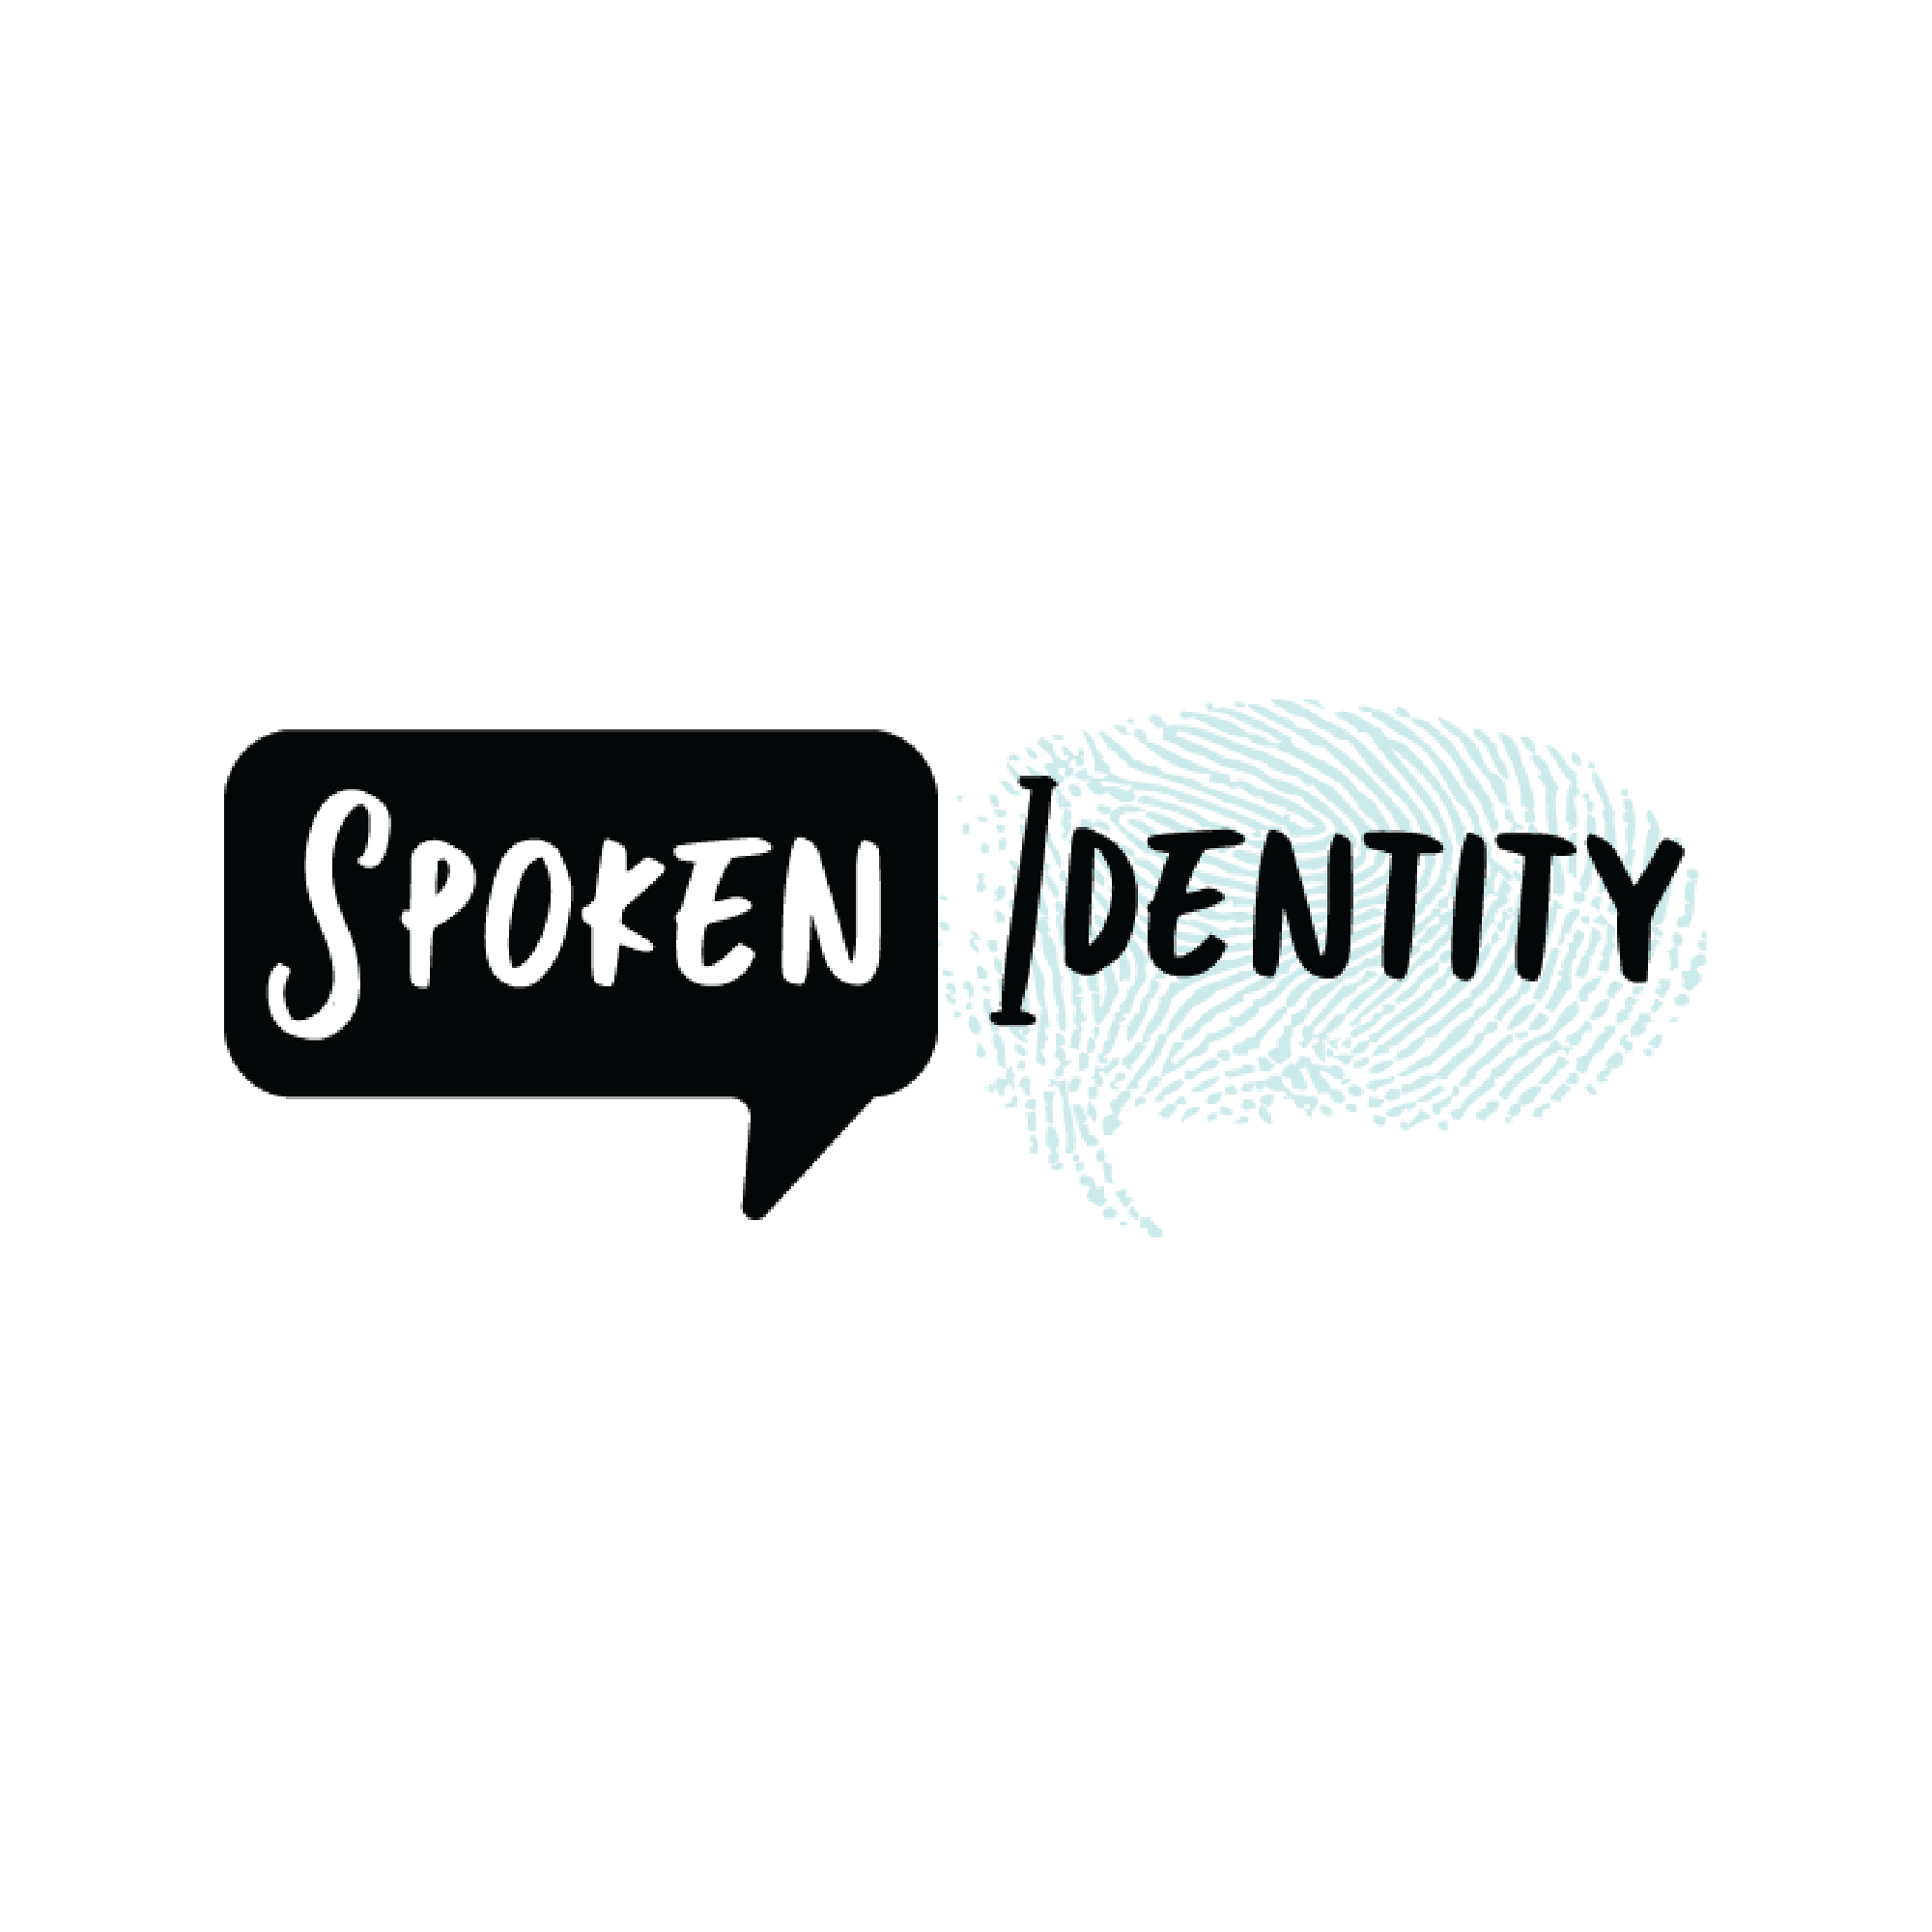 Spoken Identity